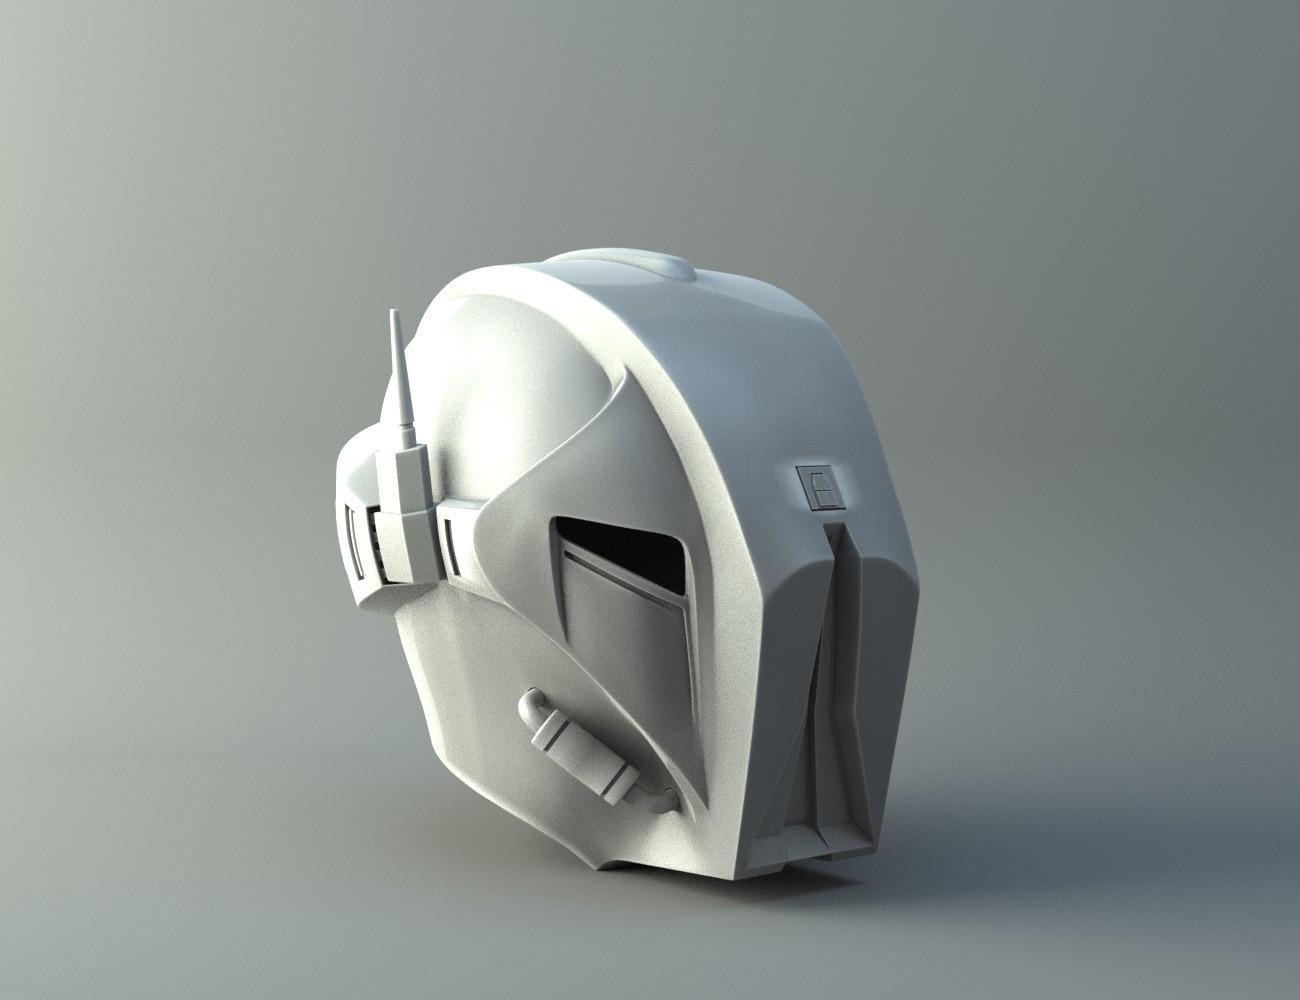 droid1.jpg Download STL file HK47 Assassin Droid - Star Wars - Helmet 3D print model • Template to 3D print, 3D-mon